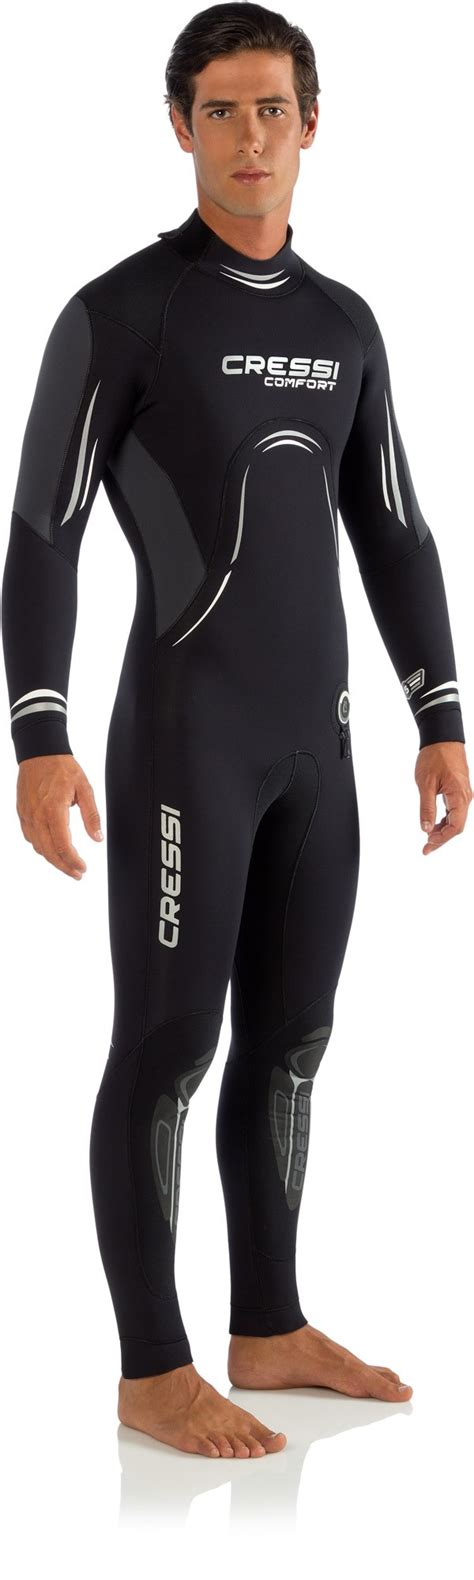 cressi comfort cressi wetsuits wetsuits comfort cressi professional scuba